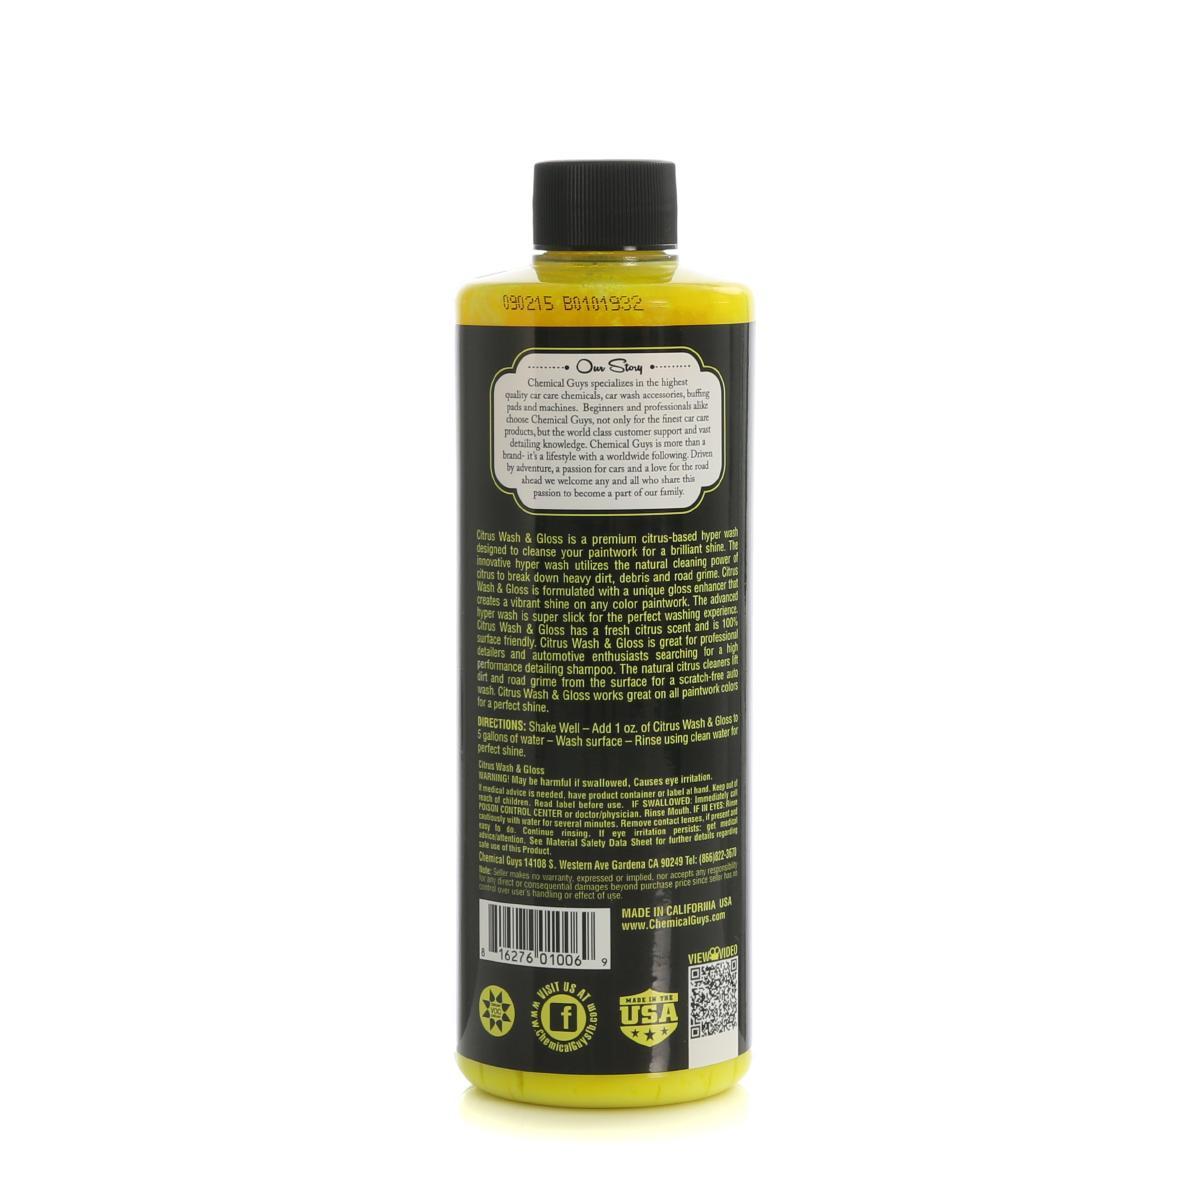 vahashampoo chemical guys citrus wash gloss 12 90. Black Bedroom Furniture Sets. Home Design Ideas